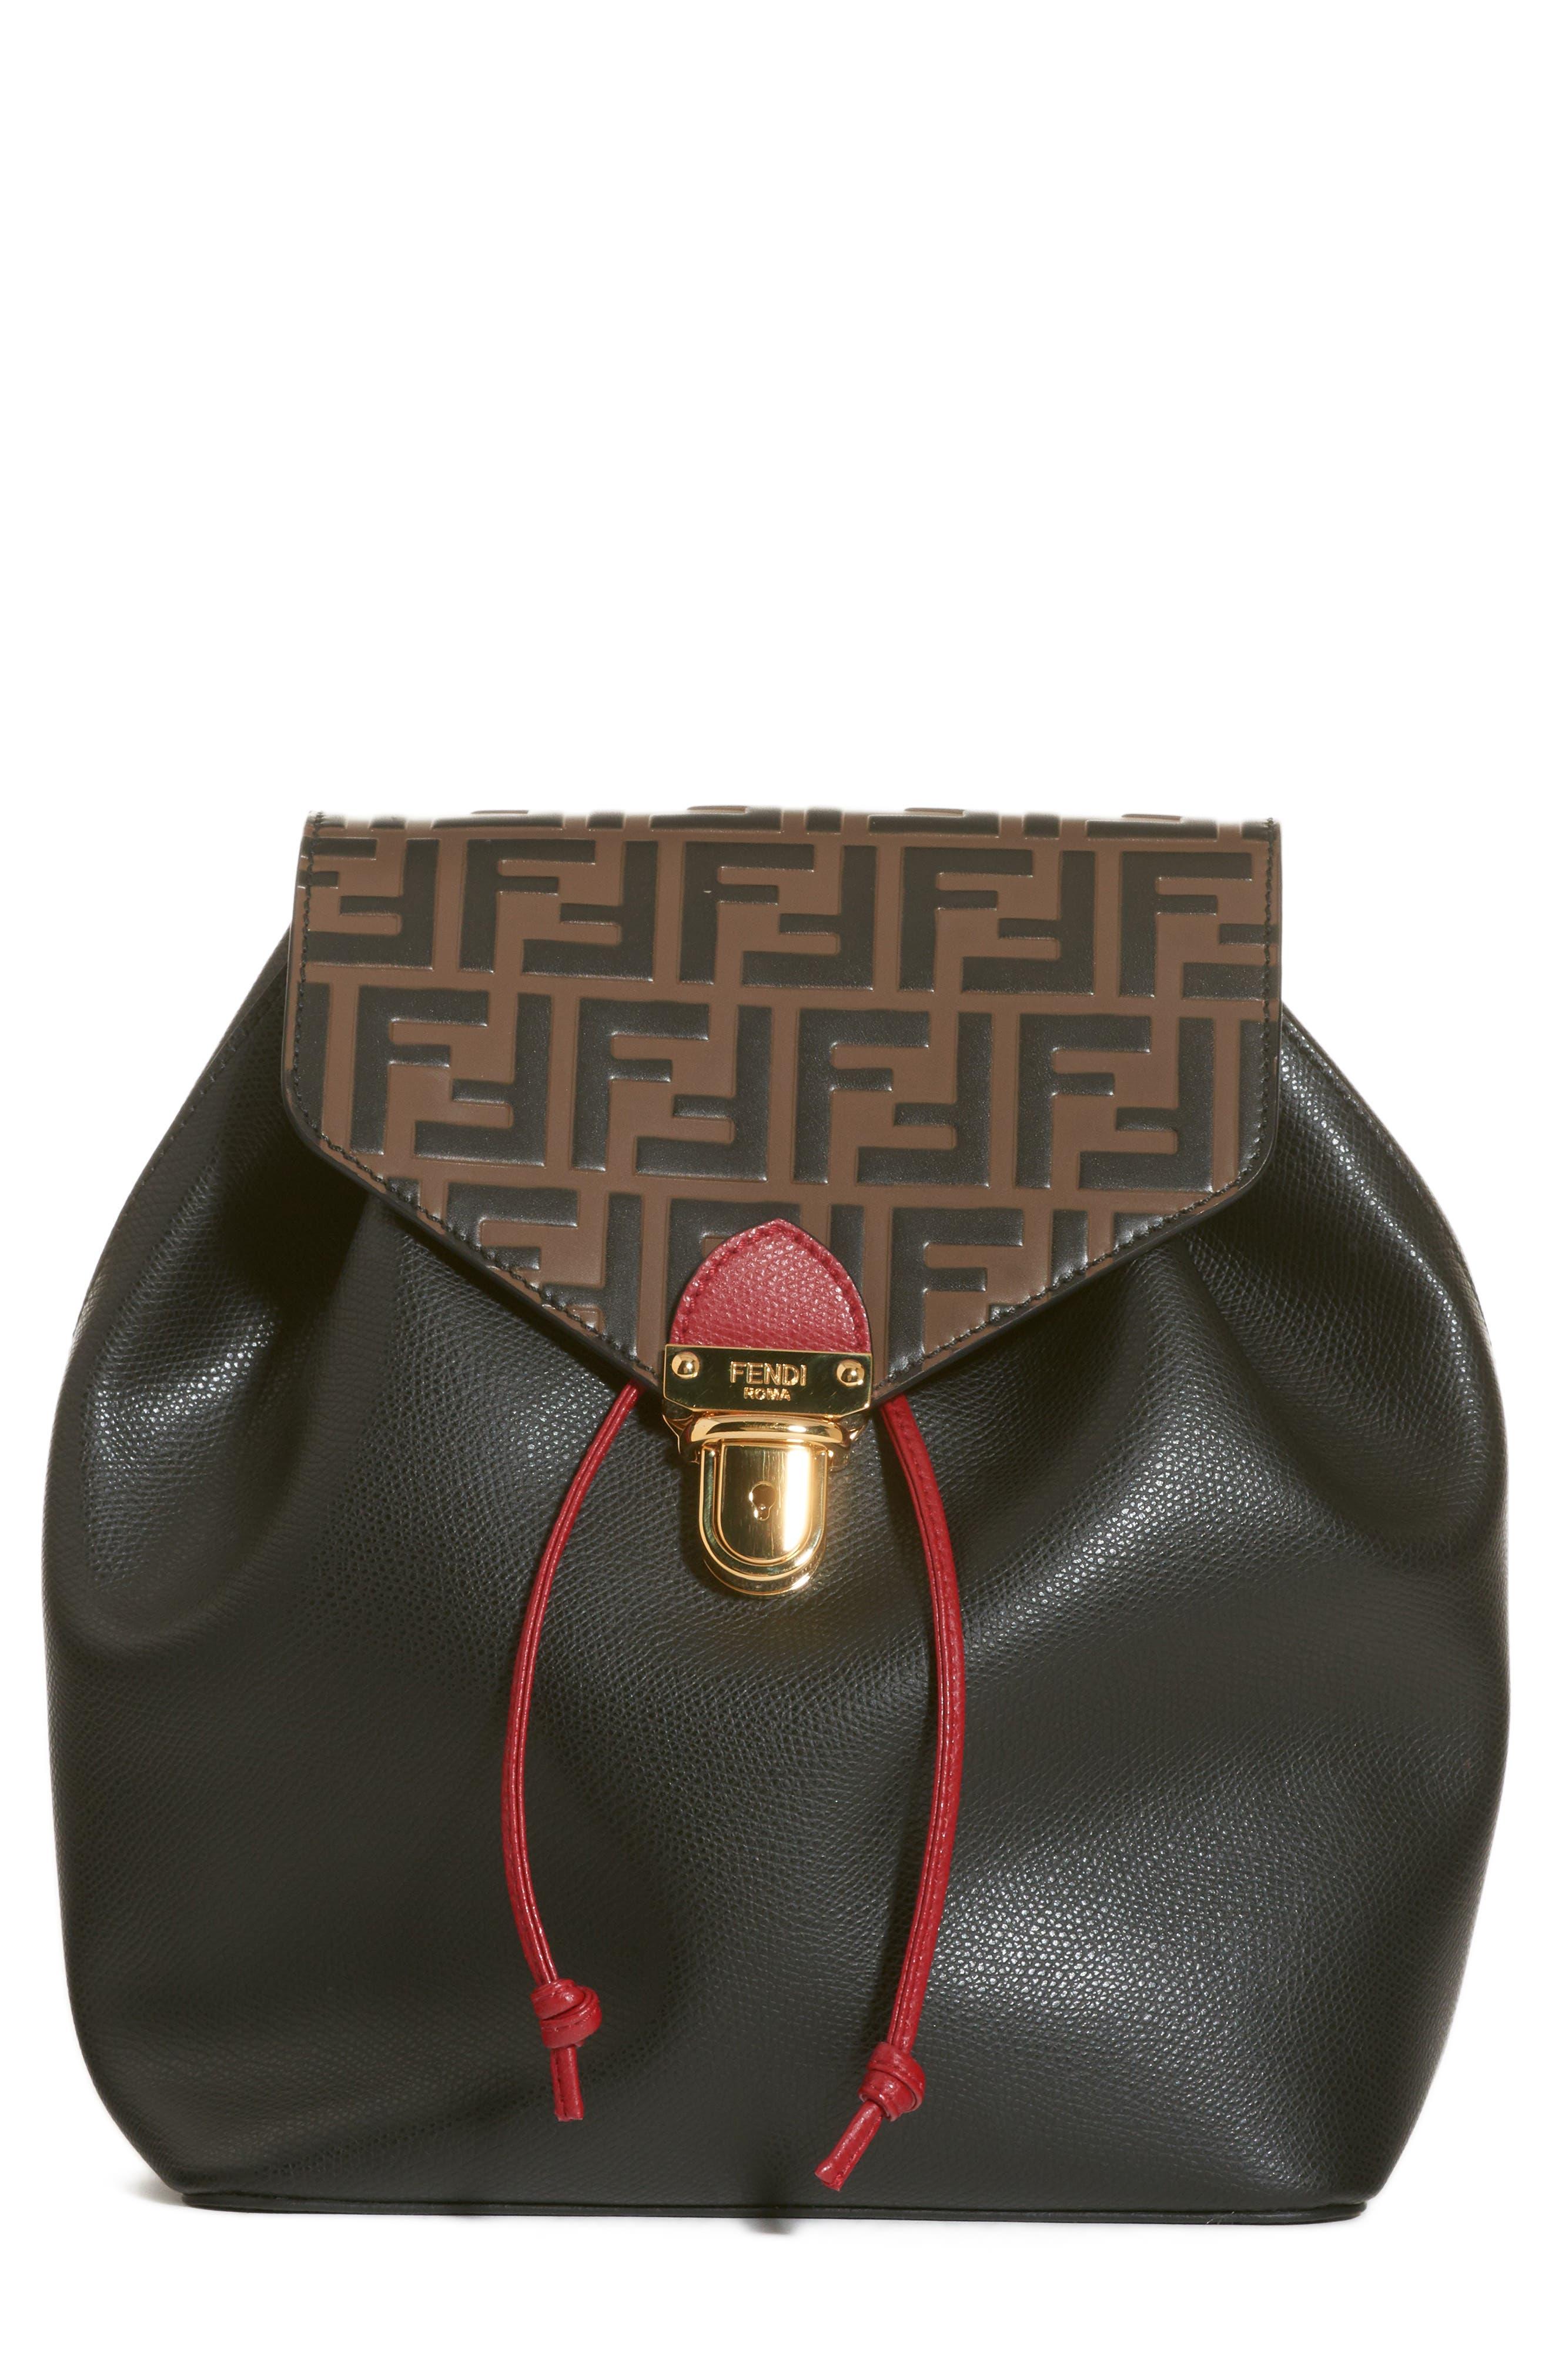 Fendi Cruise Bicolor Calfskin Leather Backpack